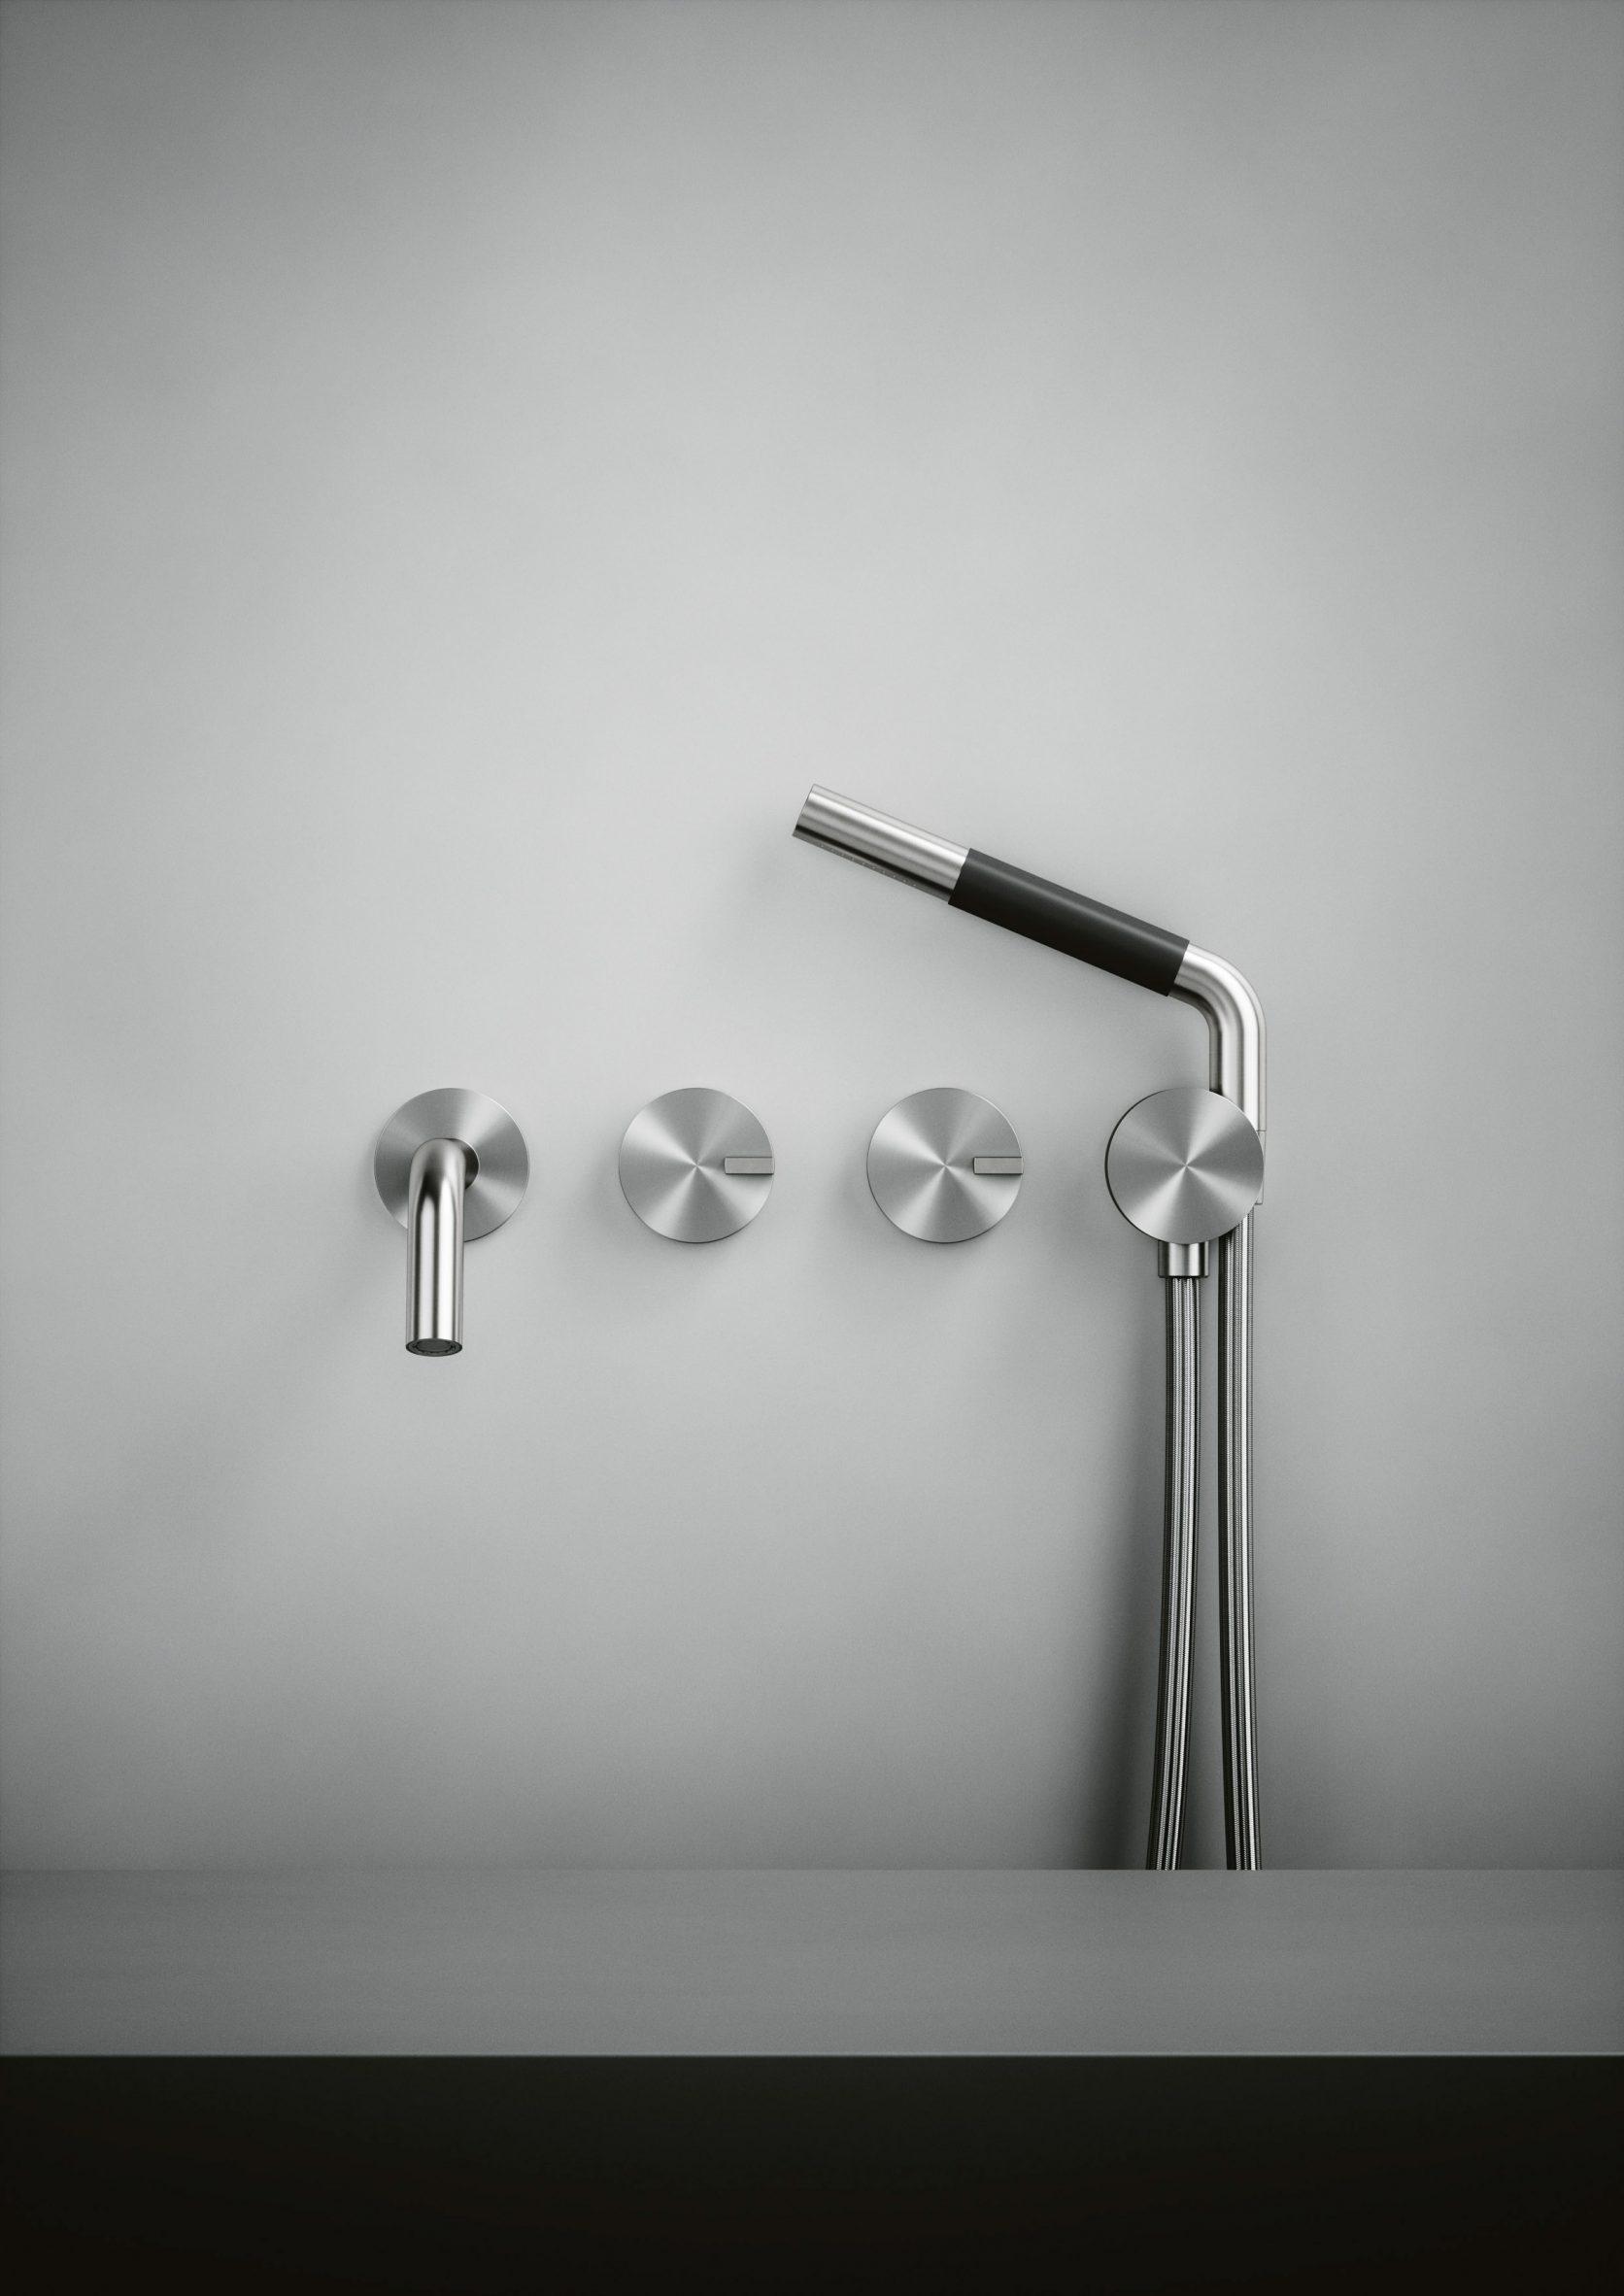 A silver showerhead and bath tap